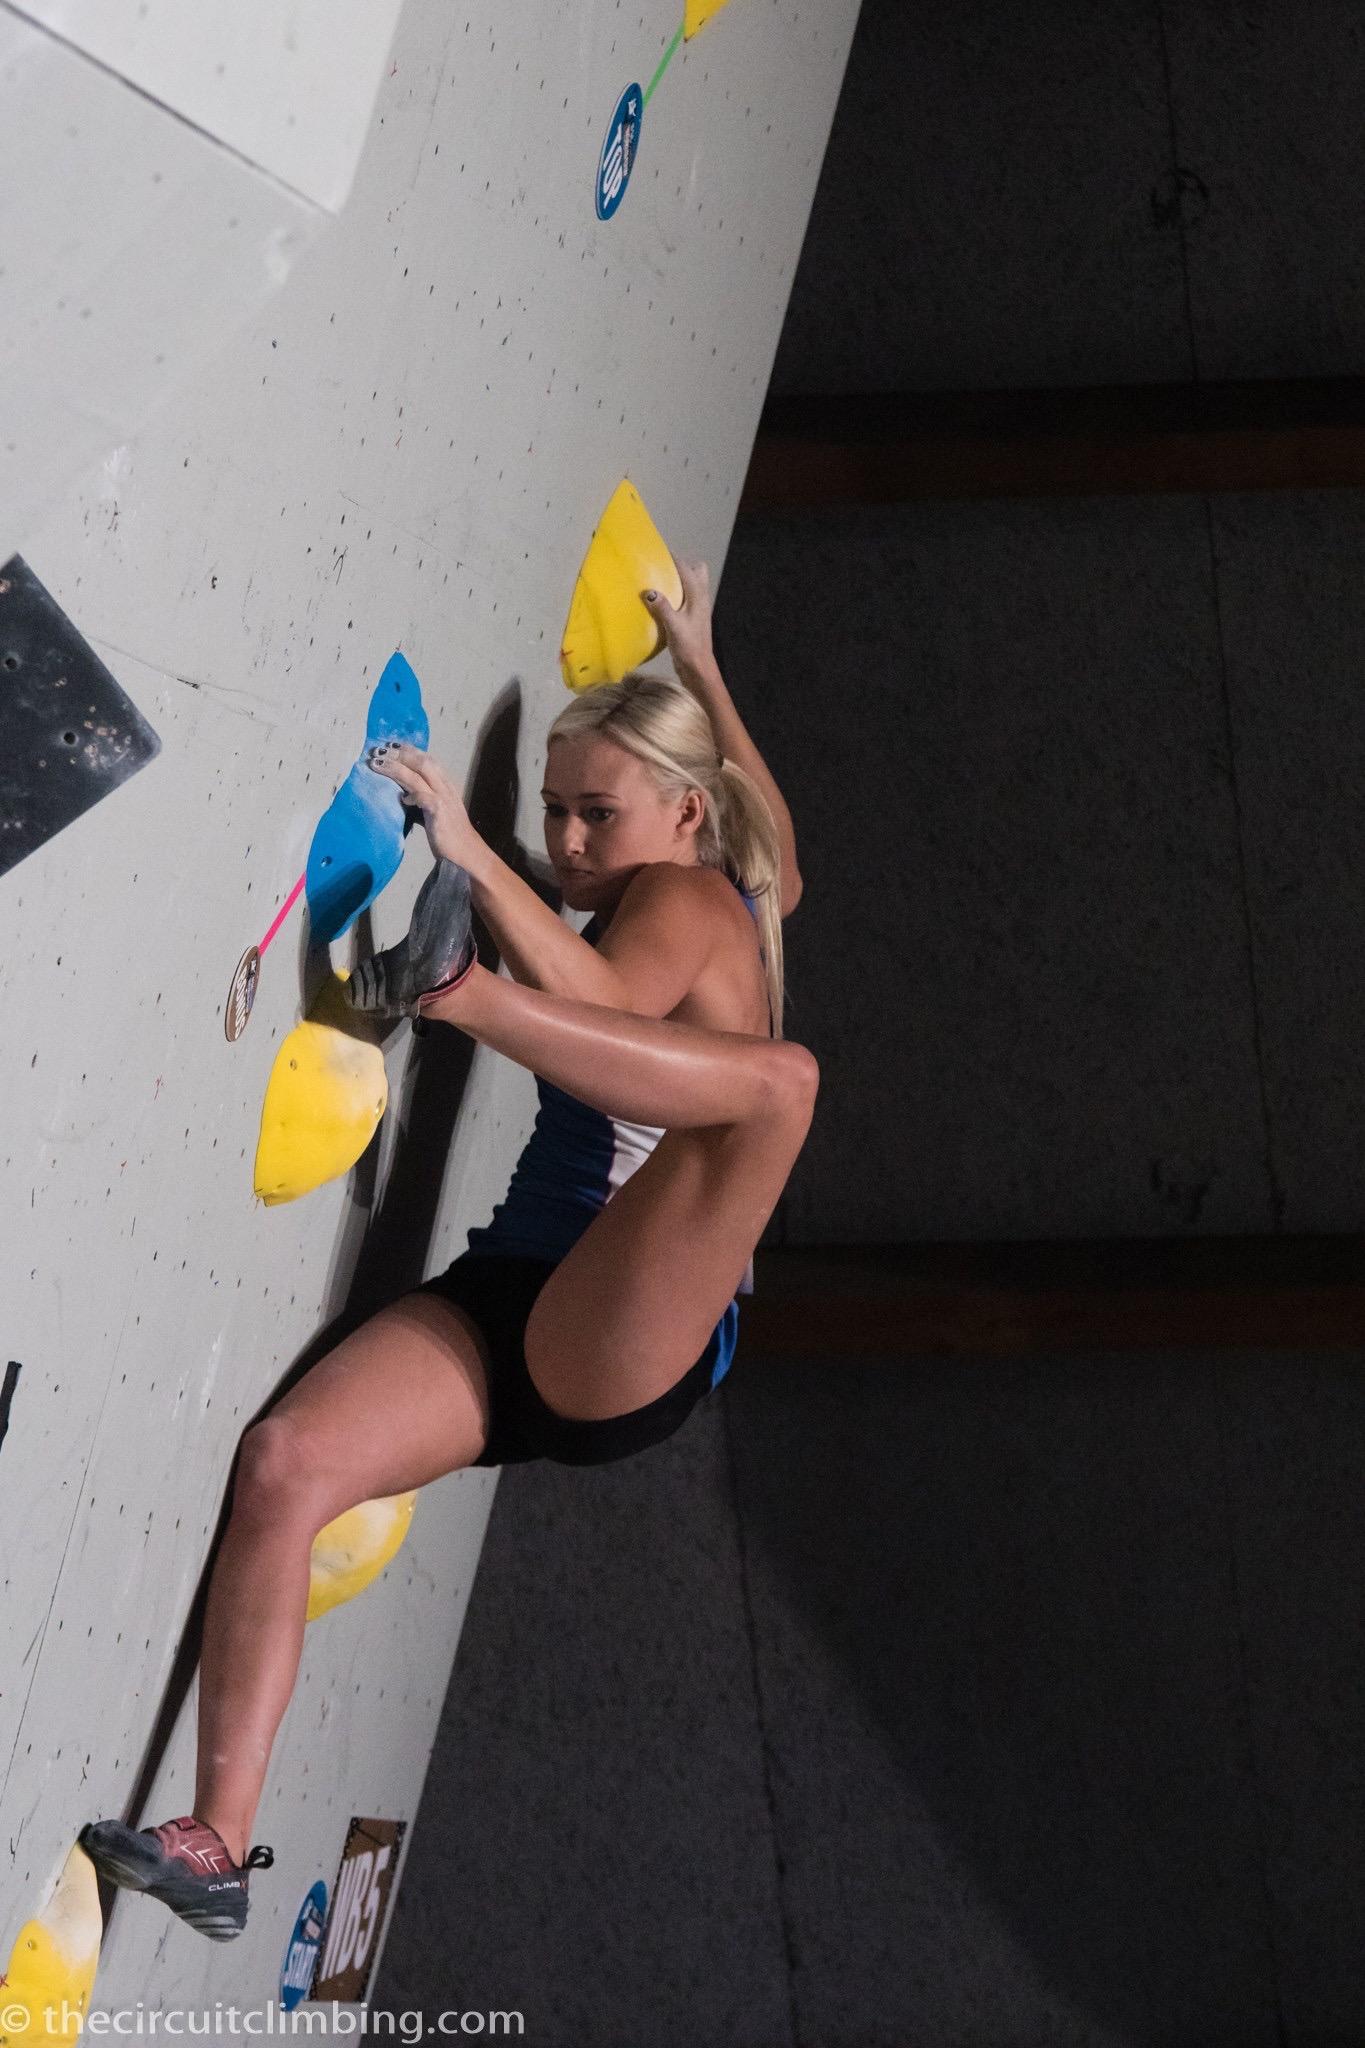 Photo: The Circuit Climbing